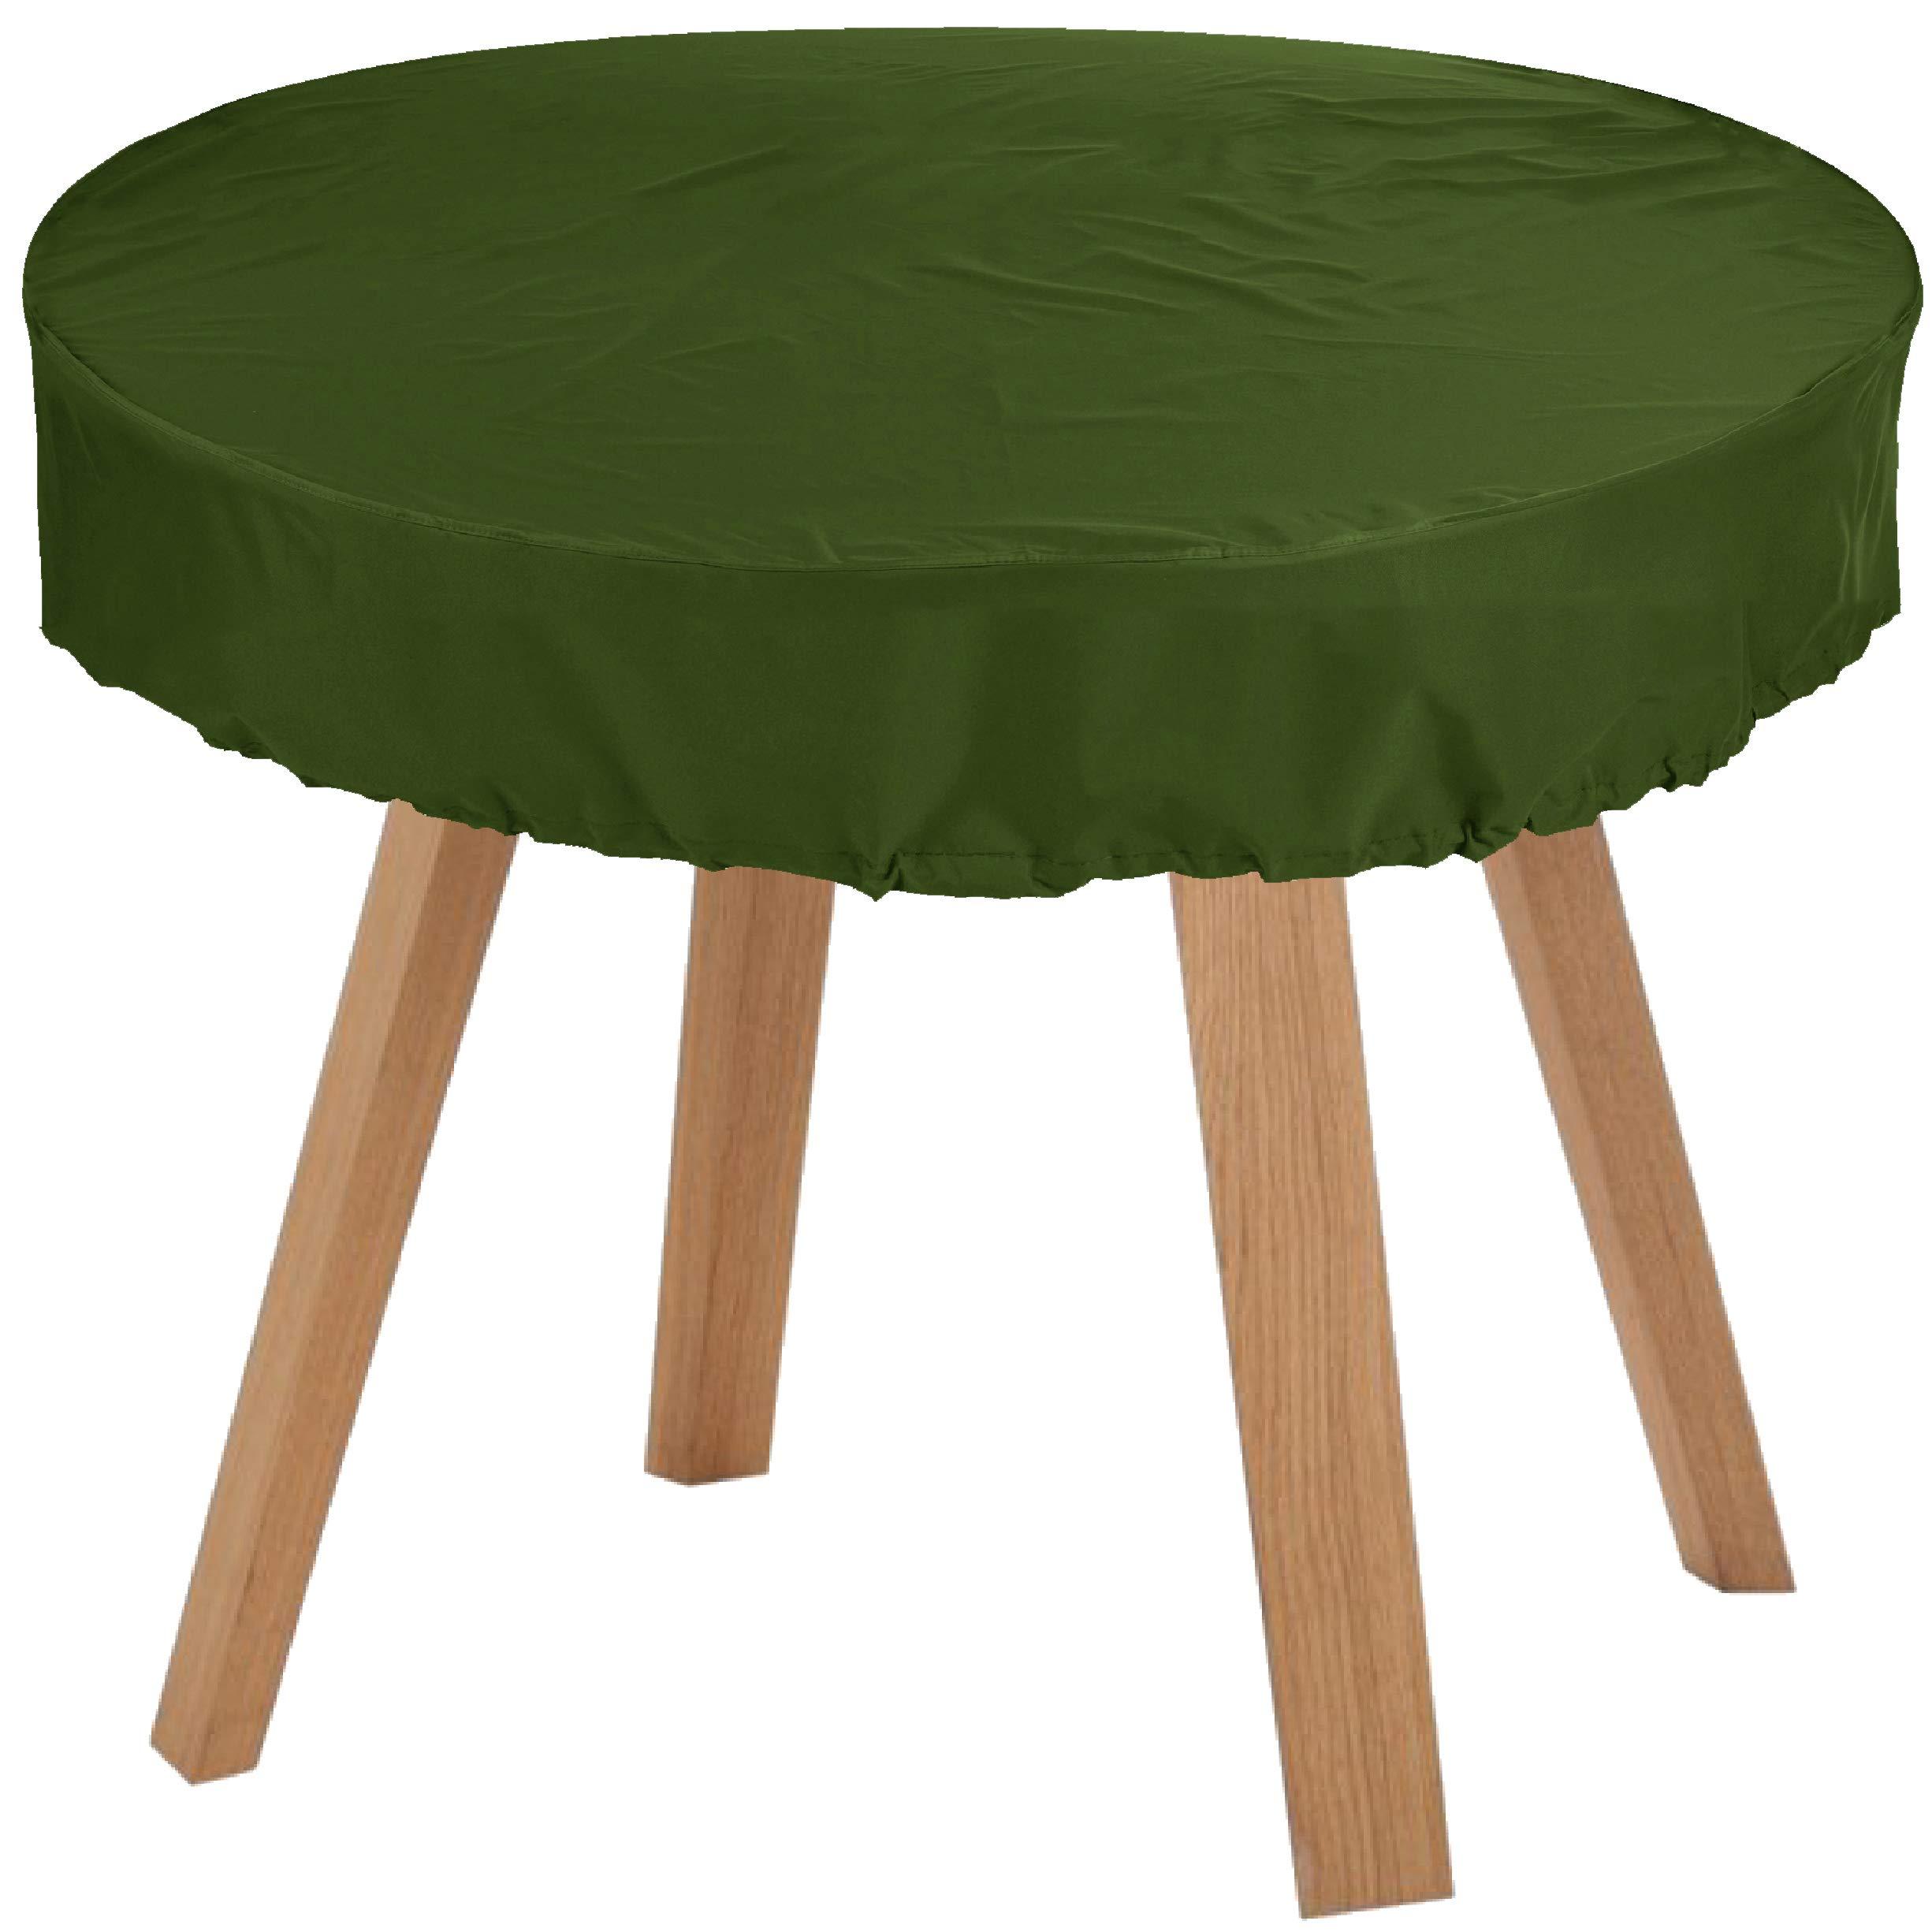 KaufPirat Premium Fundas para Mesa Redonda Ø 115x15 cm Cubierta Impermeable Funda para Mesa para Mobiliario de Exterior, Oxford Fundas para Proteger Muebles de Jardín Verde Oliva: Amazon.es: Jardín